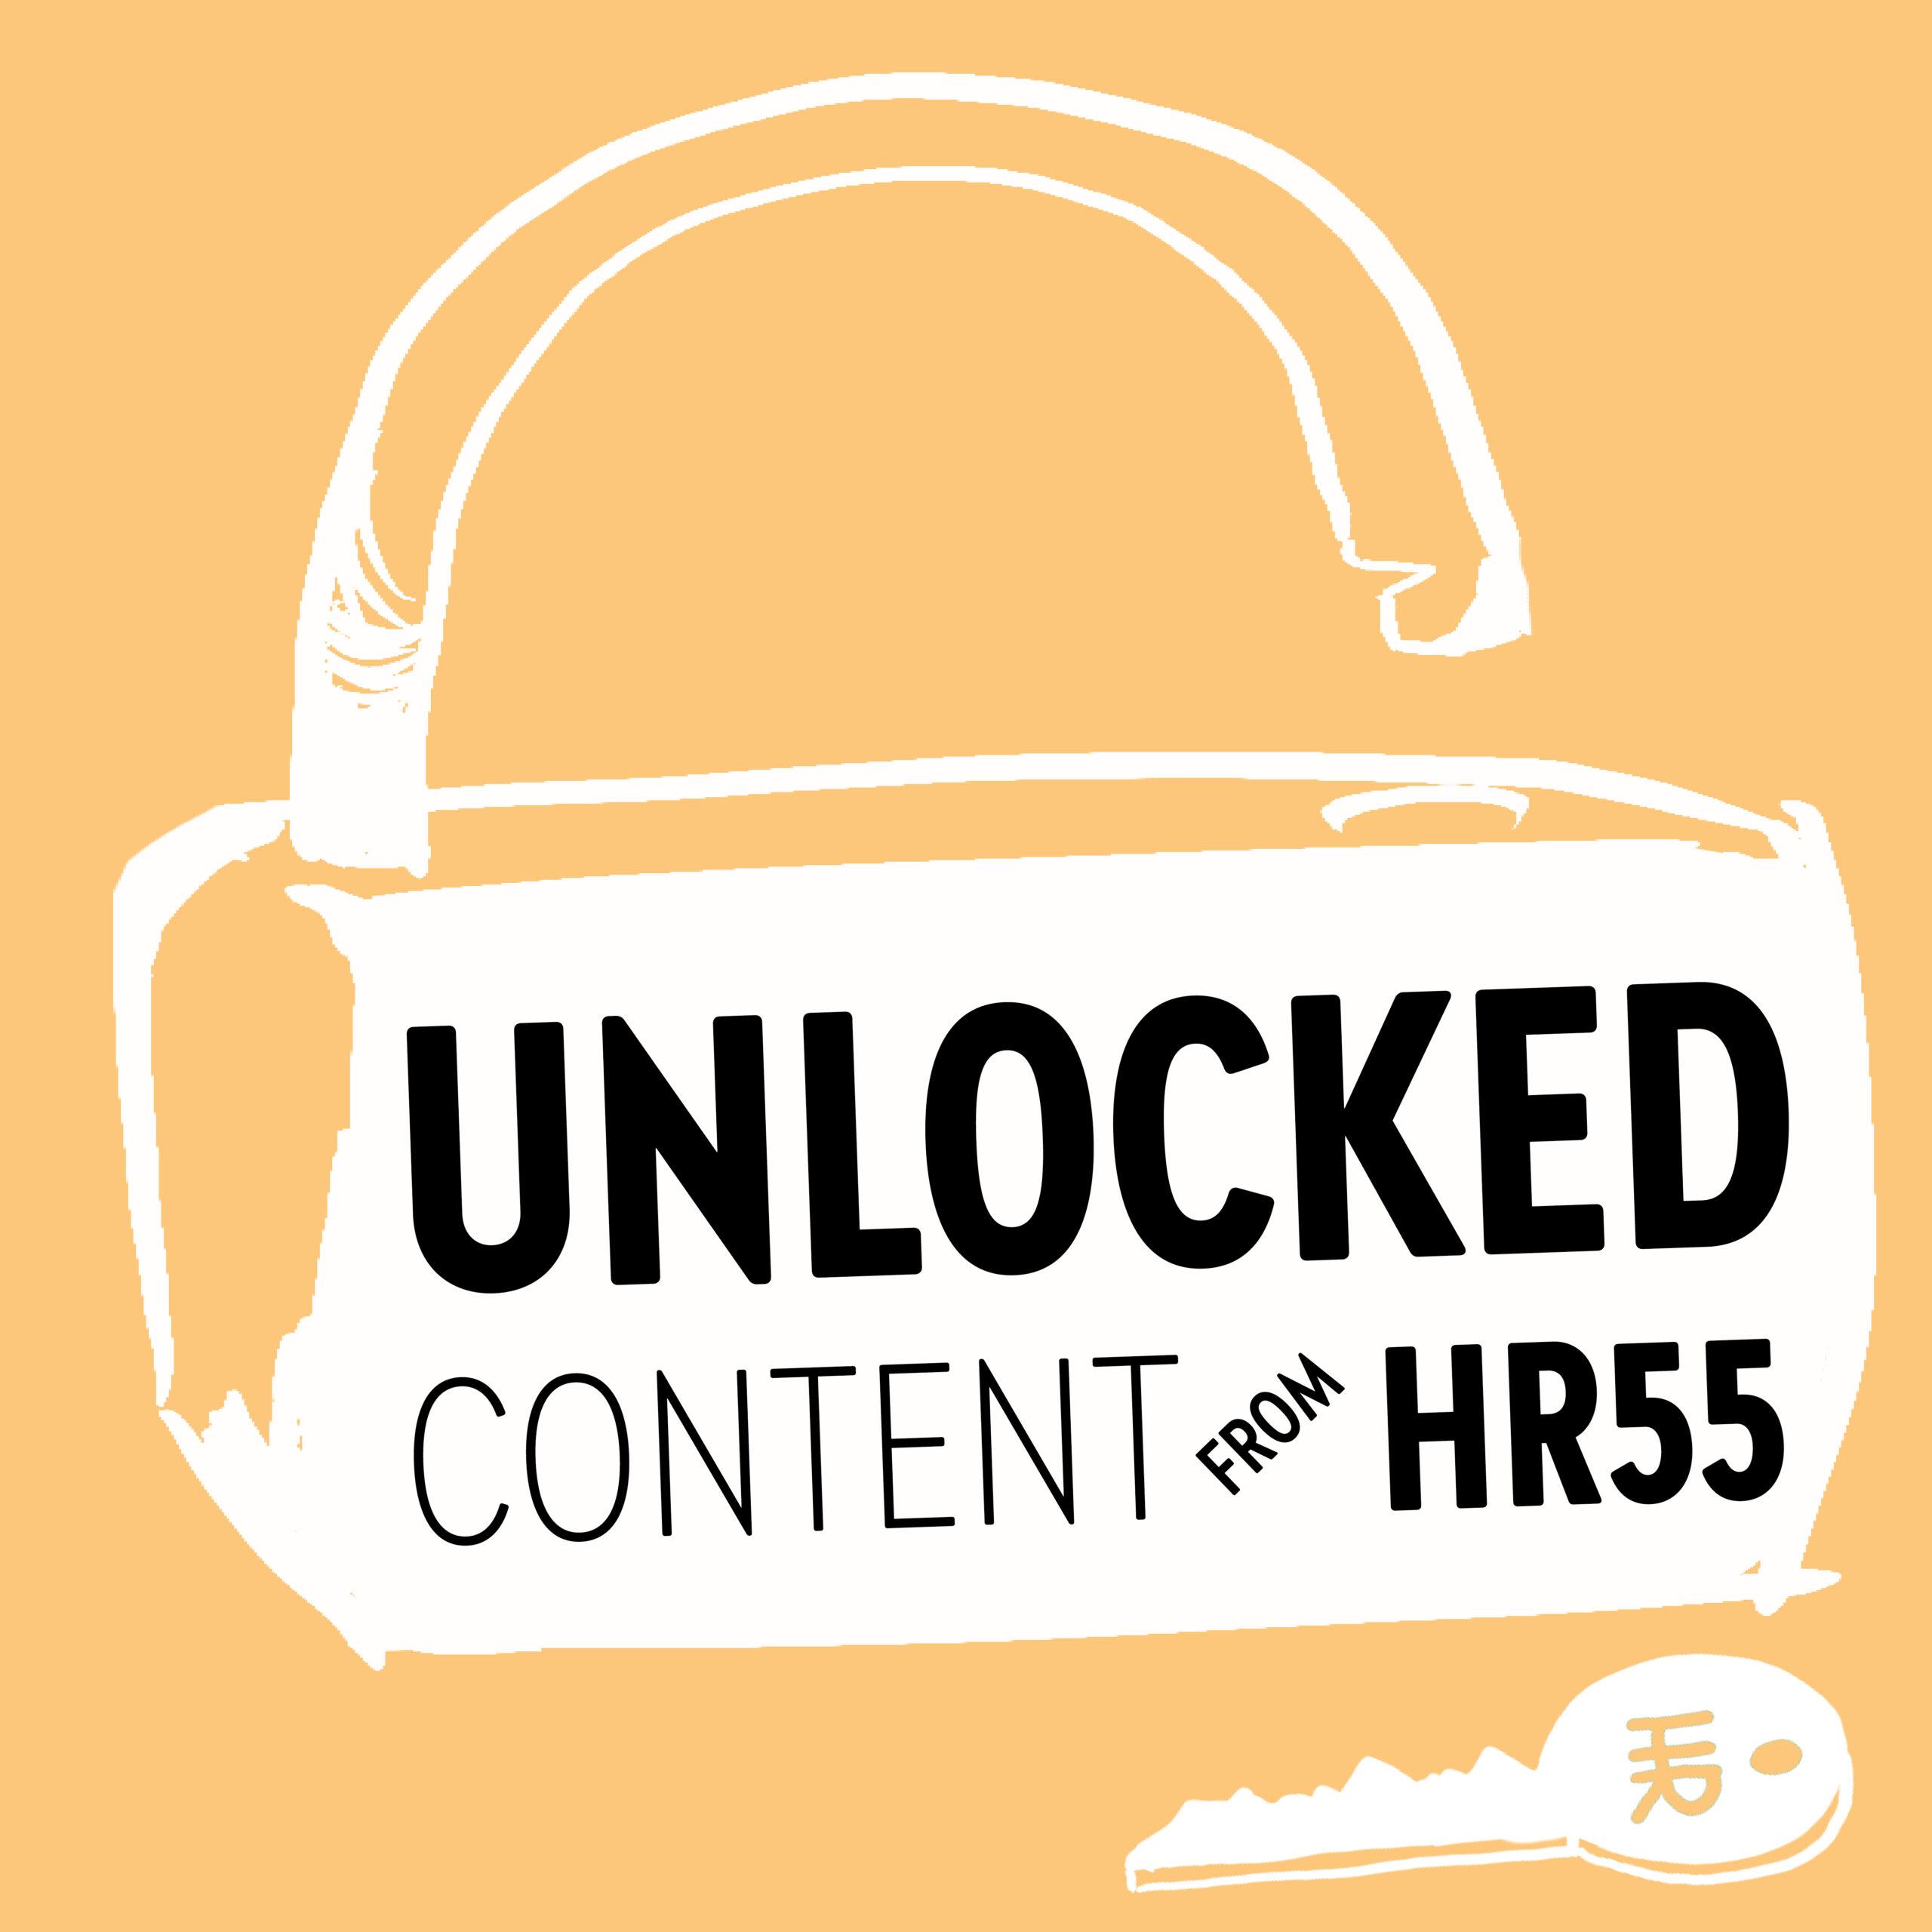 unlocked content